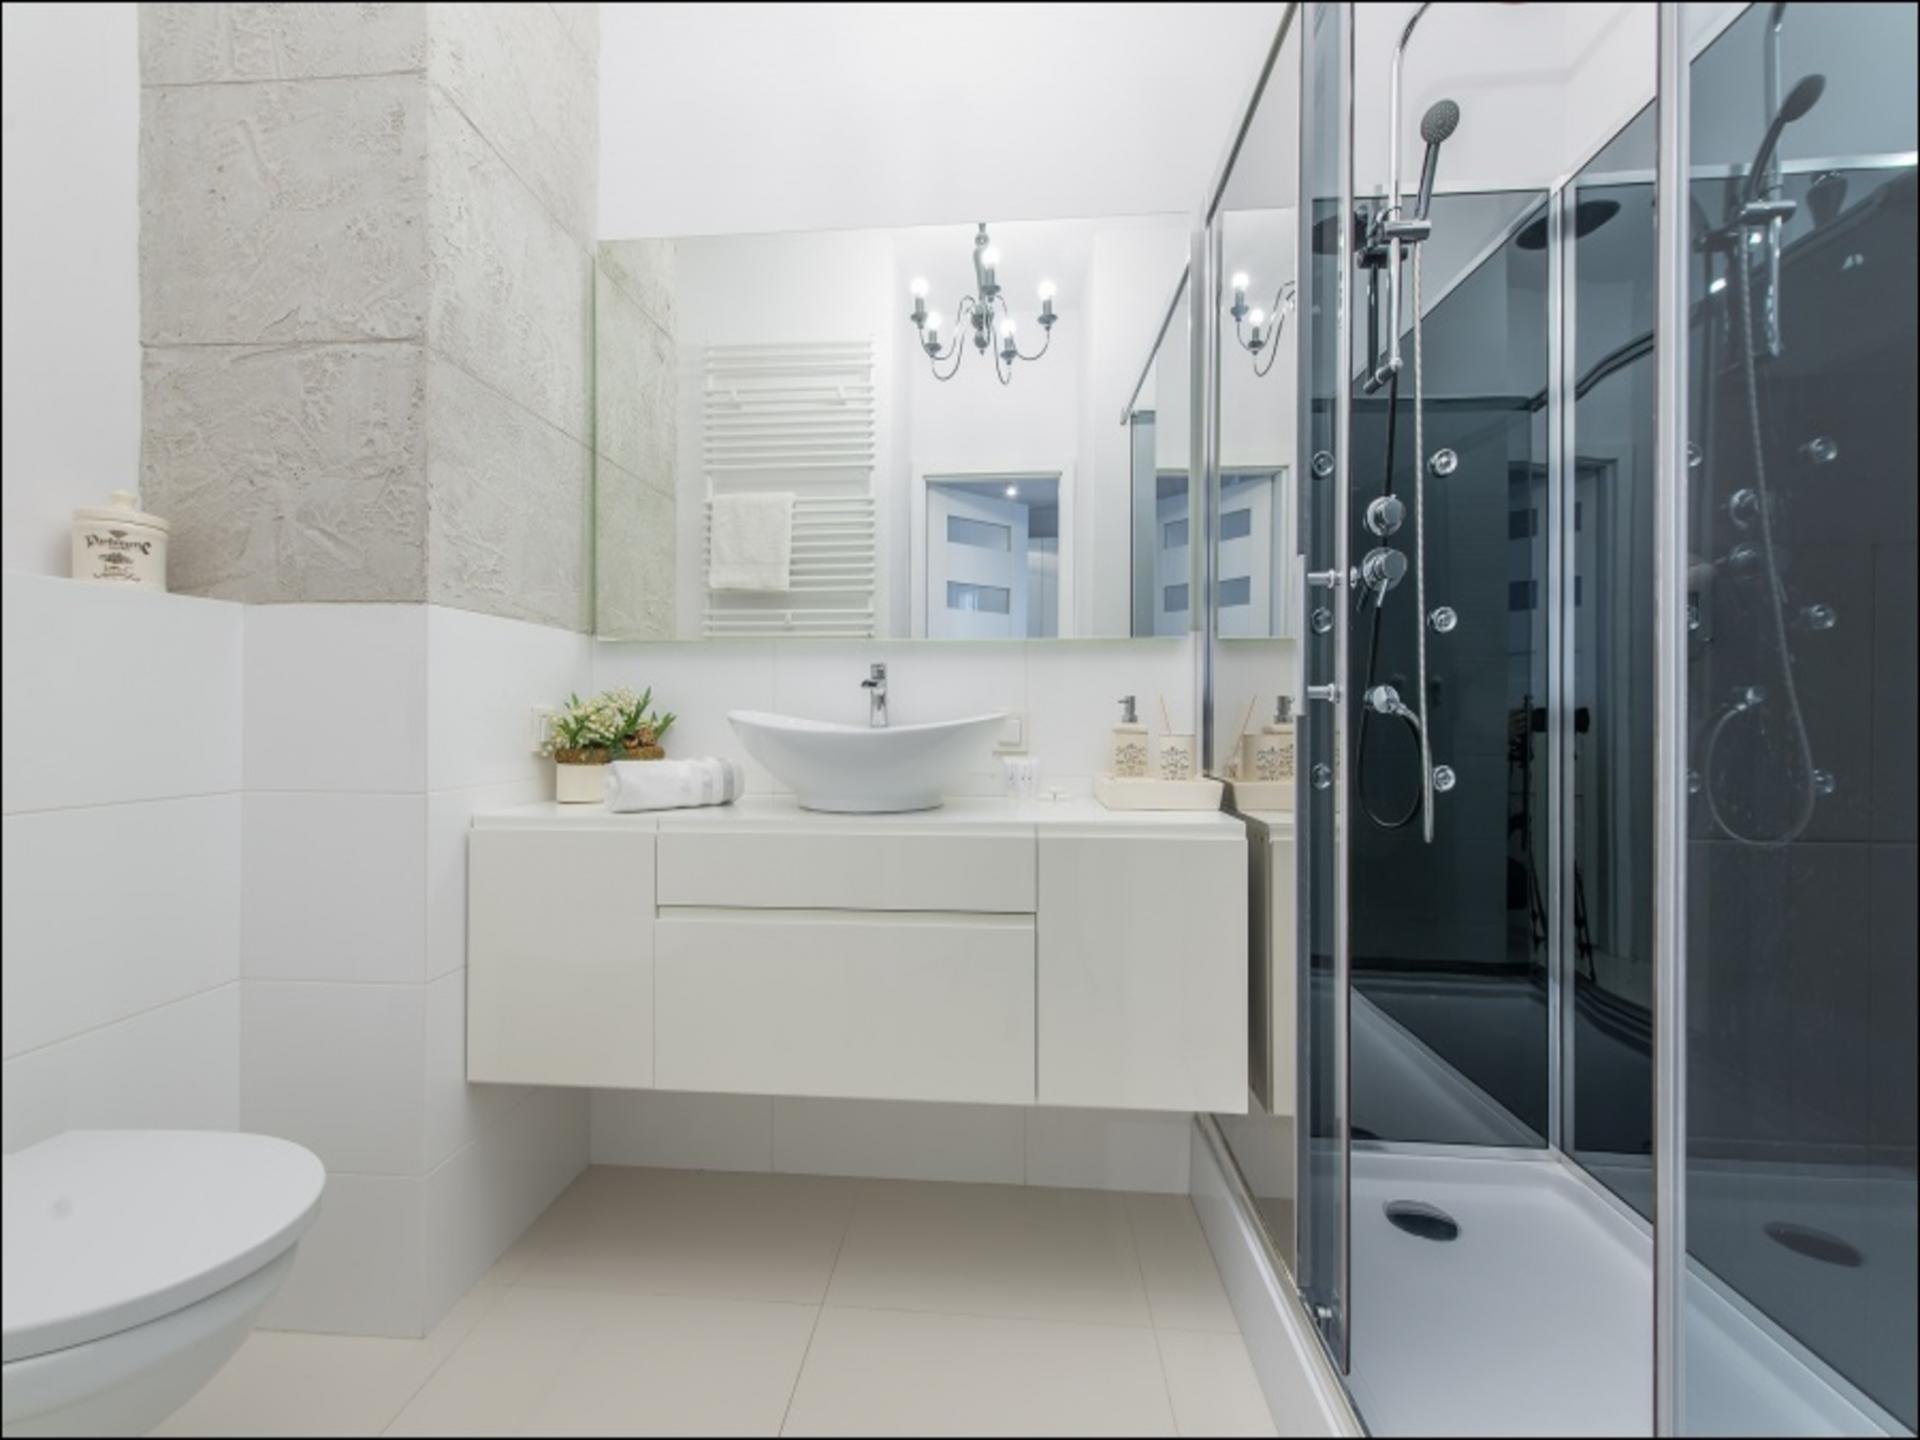 Bathroom at Klobucka Street Apartment, Wyczółki, Warsaw